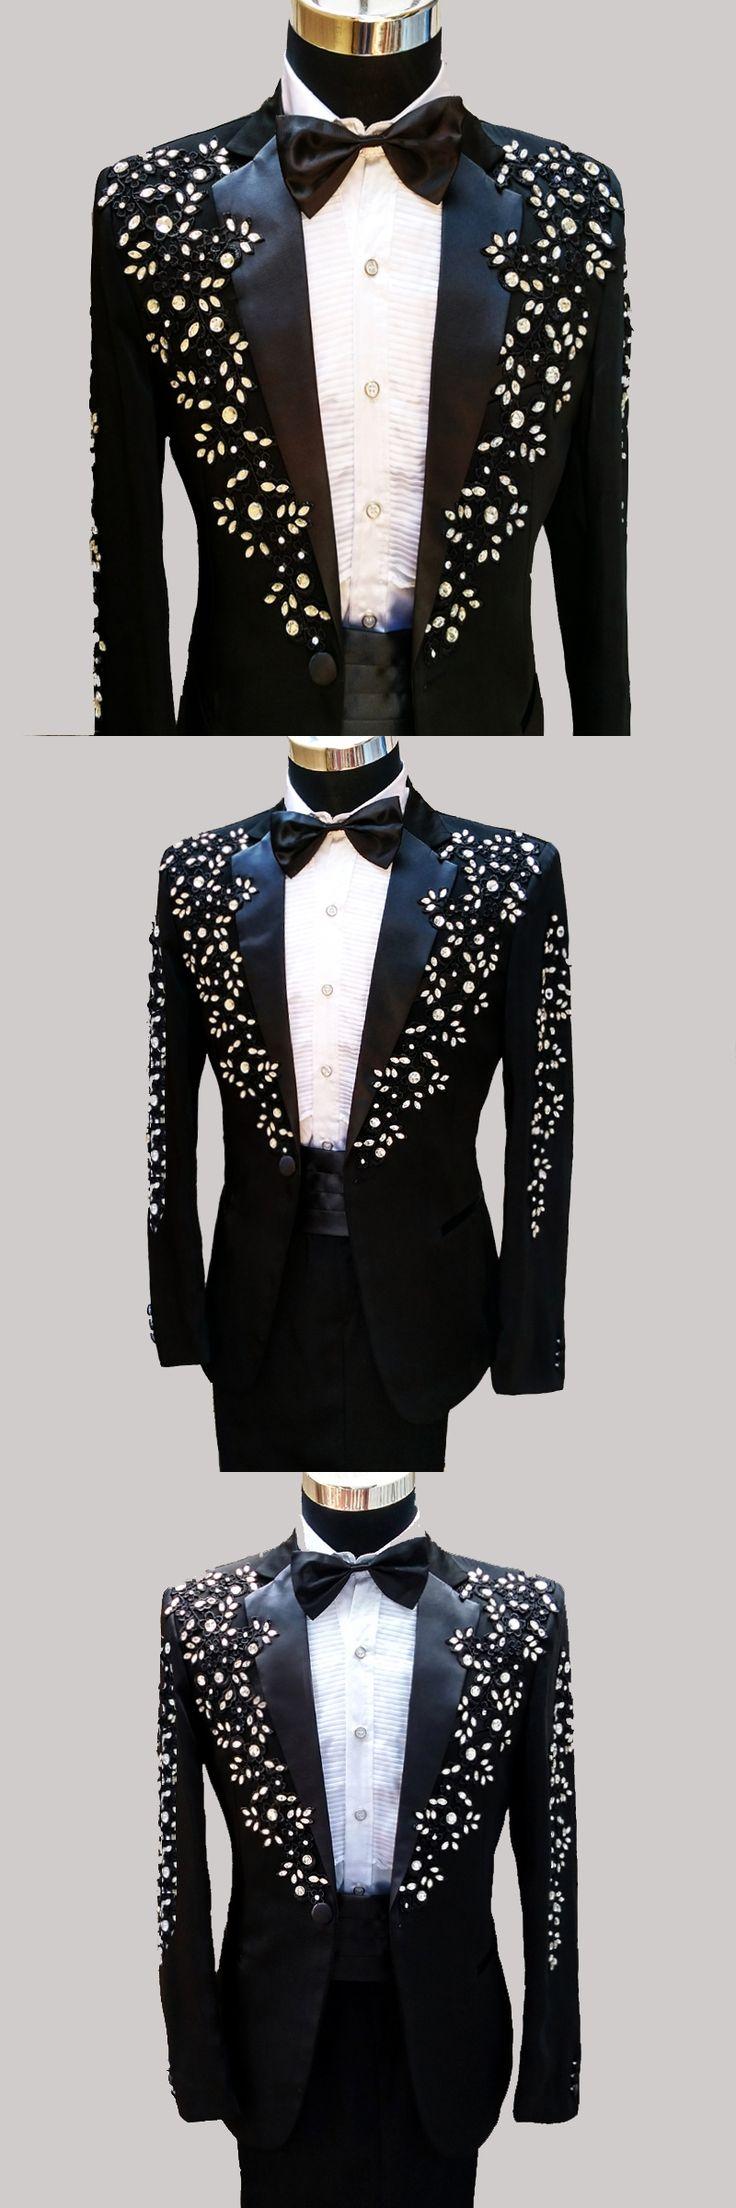 Latest Coat Pant Designs Black Groom Tuxedos Appliqued Rhinestones Mens Wedding Suits Performance Costumes(Jacket+Pants+Girdle)